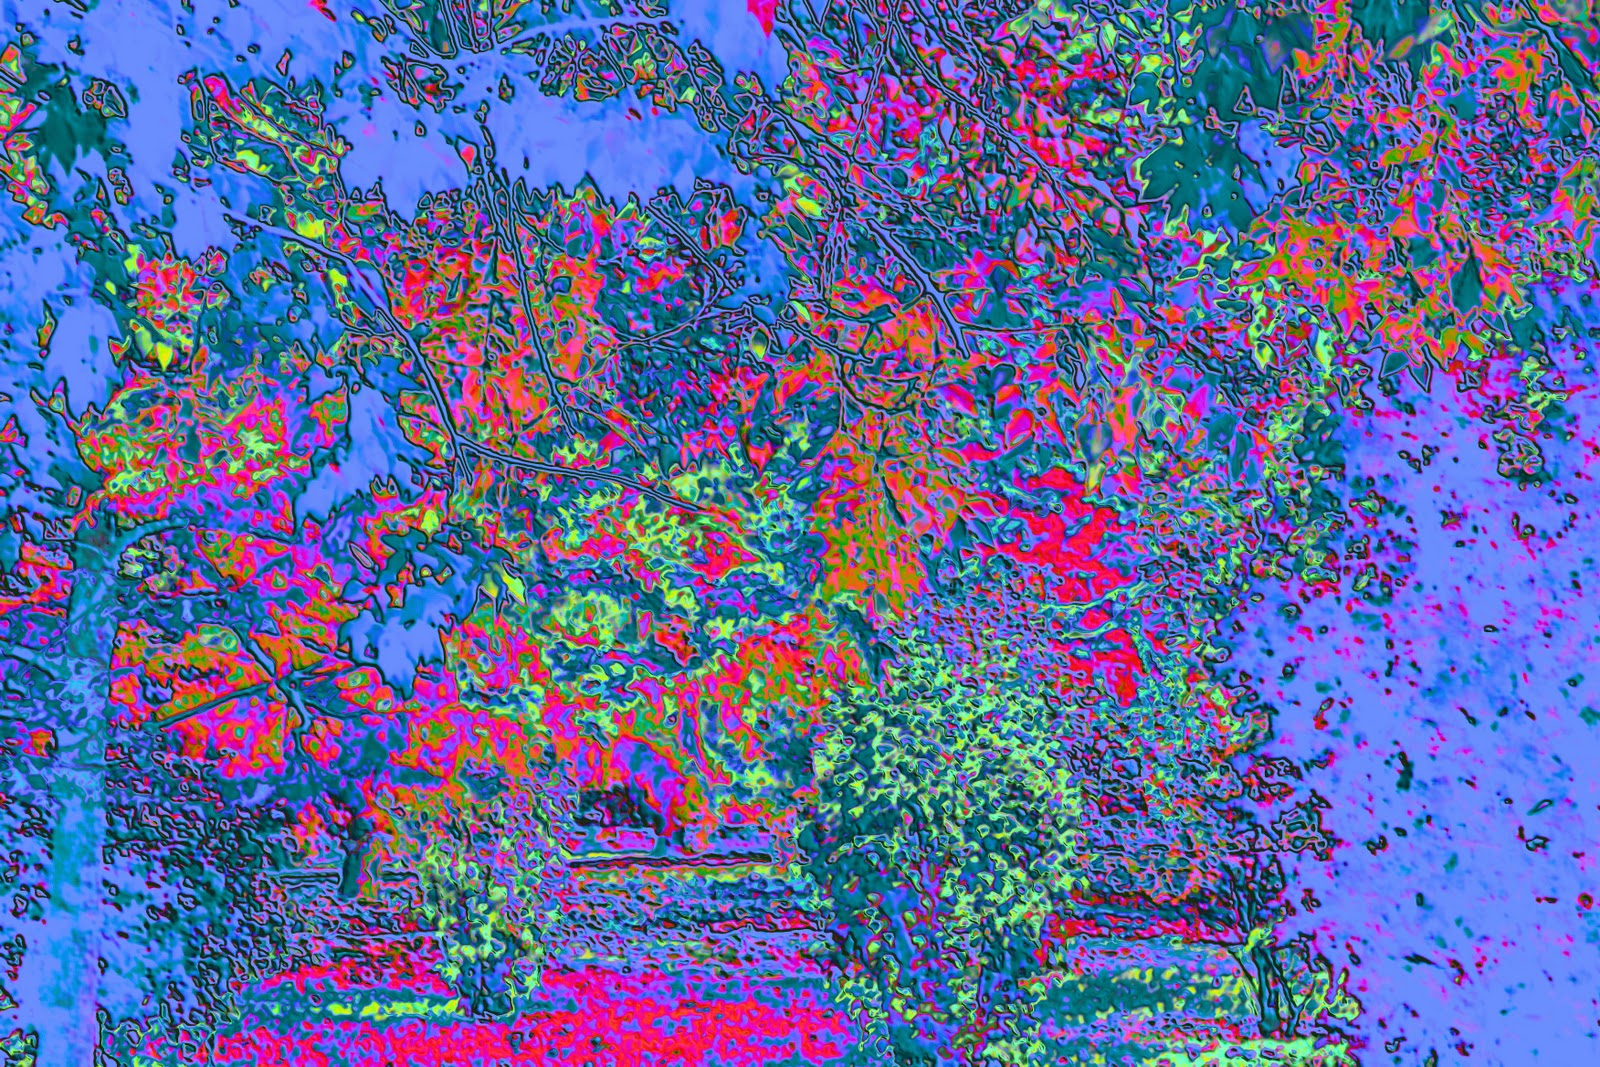 Mis cuadros pintura abstracta expresionismo abstracto for Imagenes de cuadros abstractos faciles